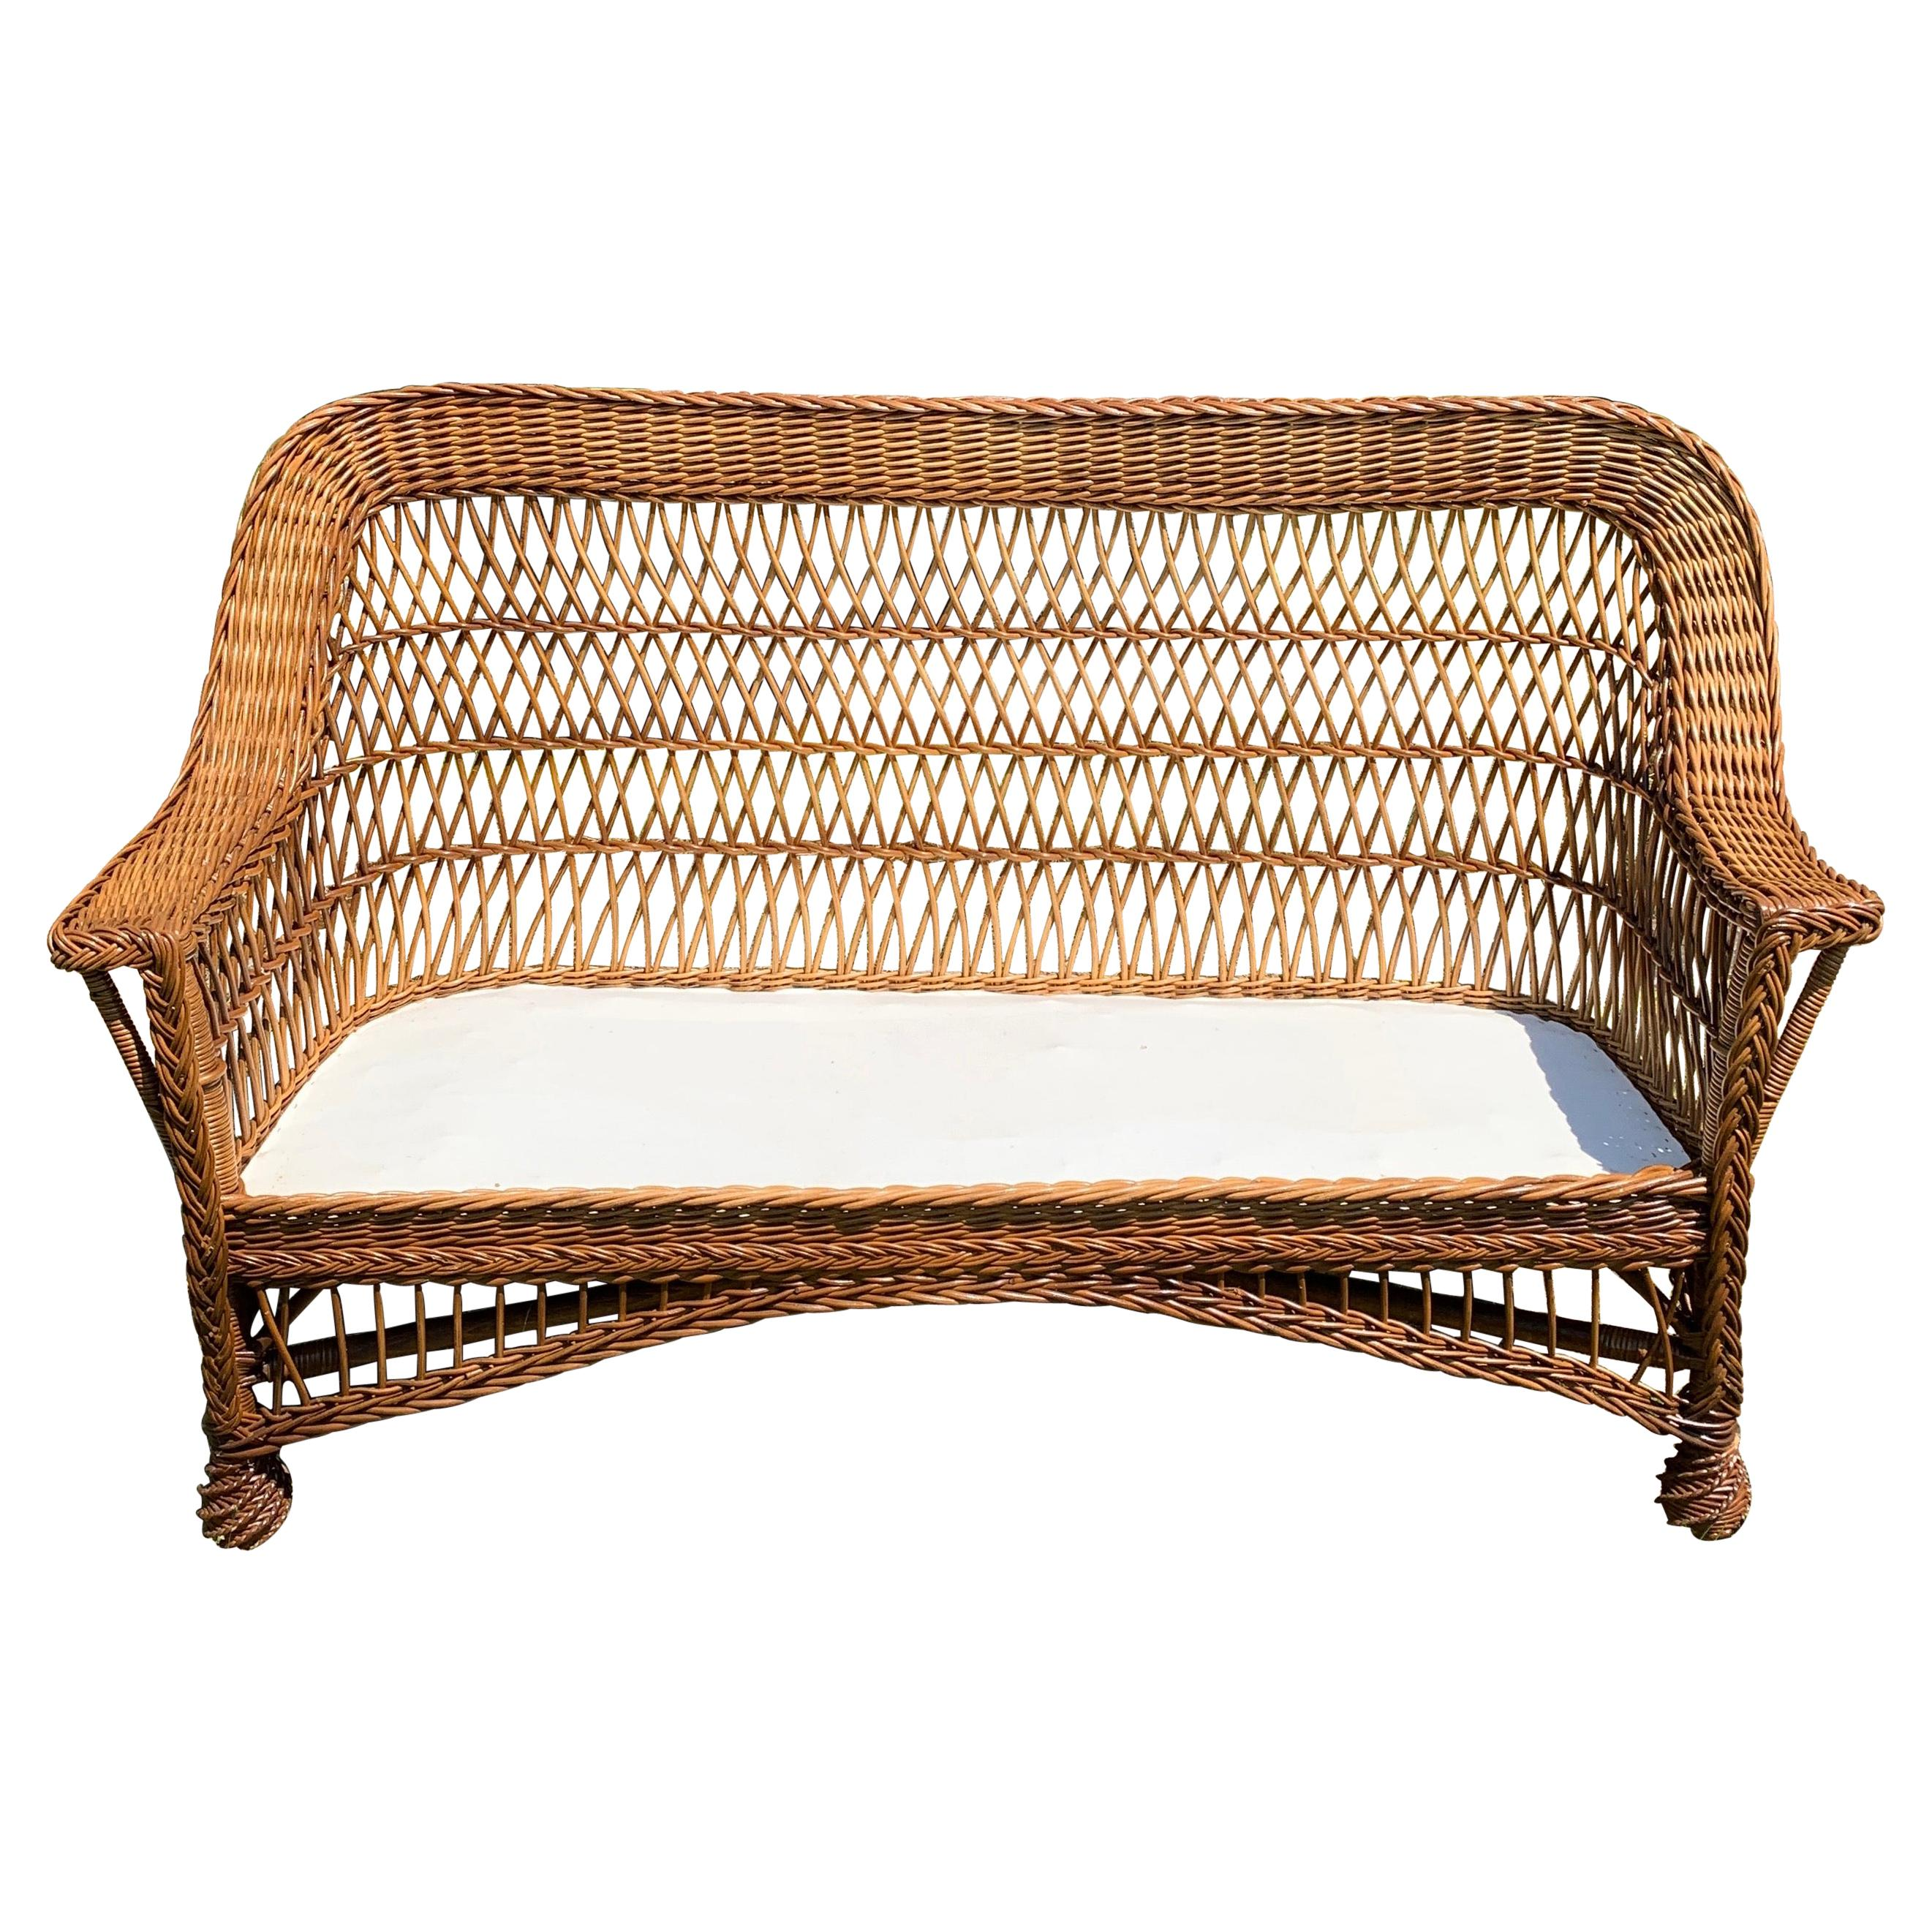 Antique Bar Harbor Wicker Sofa